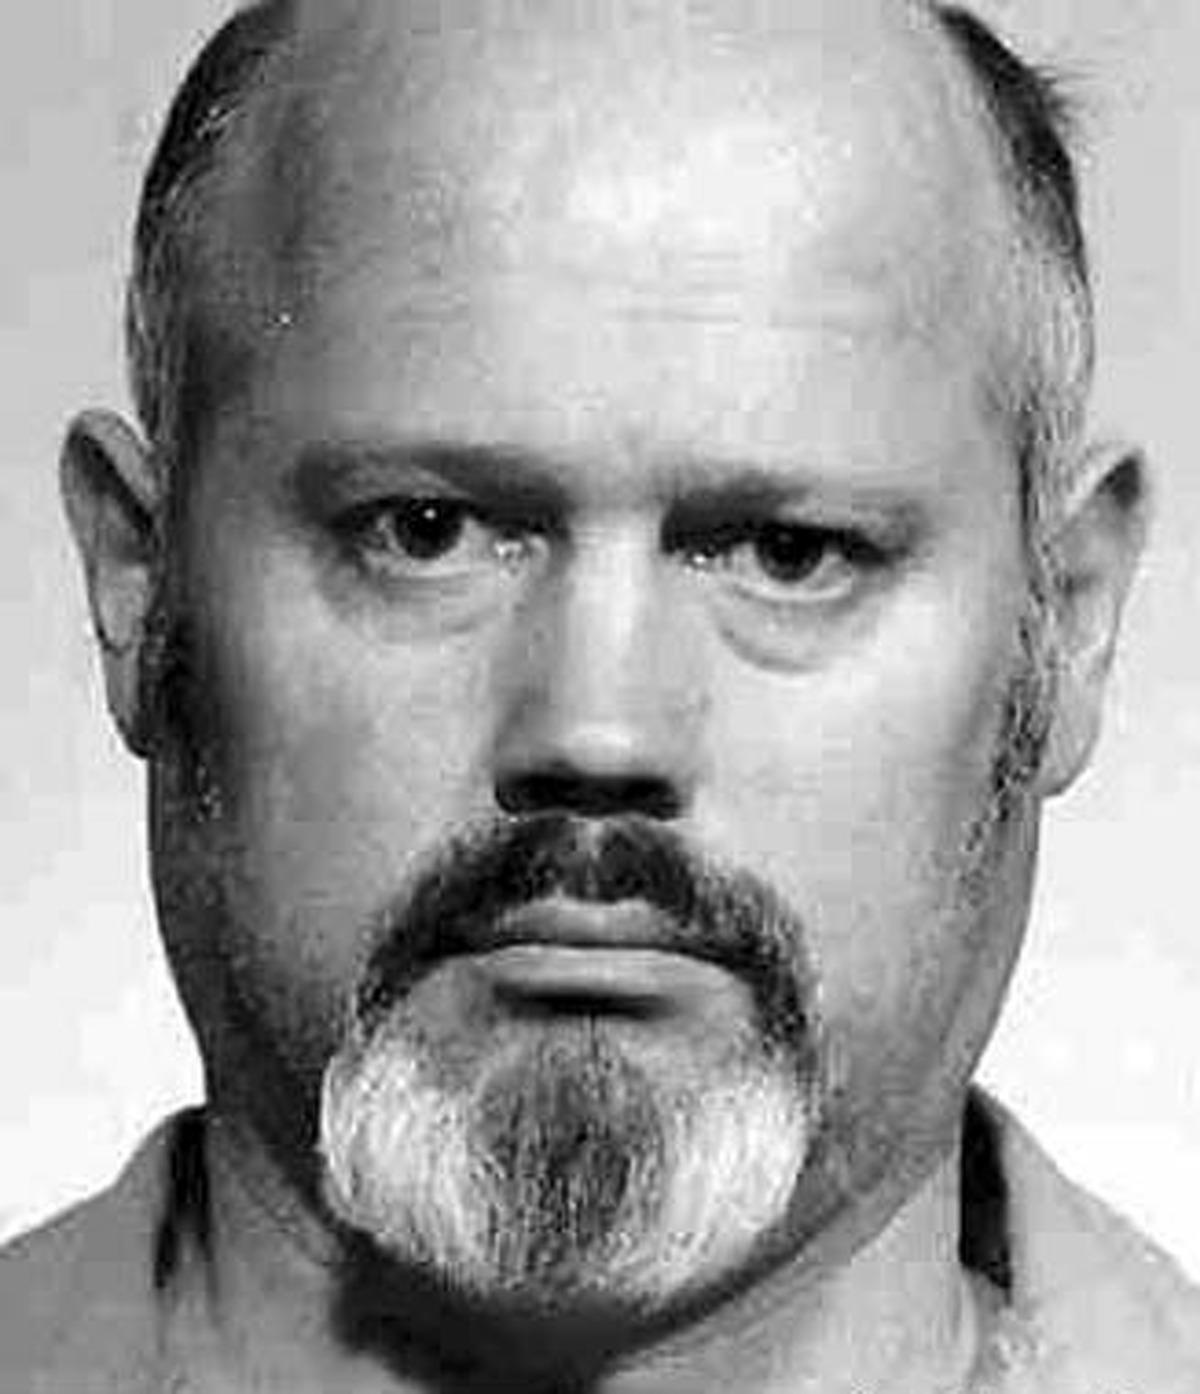 Undated file photo of suspected Zodiac serial killer Arthur Leigh Allen.